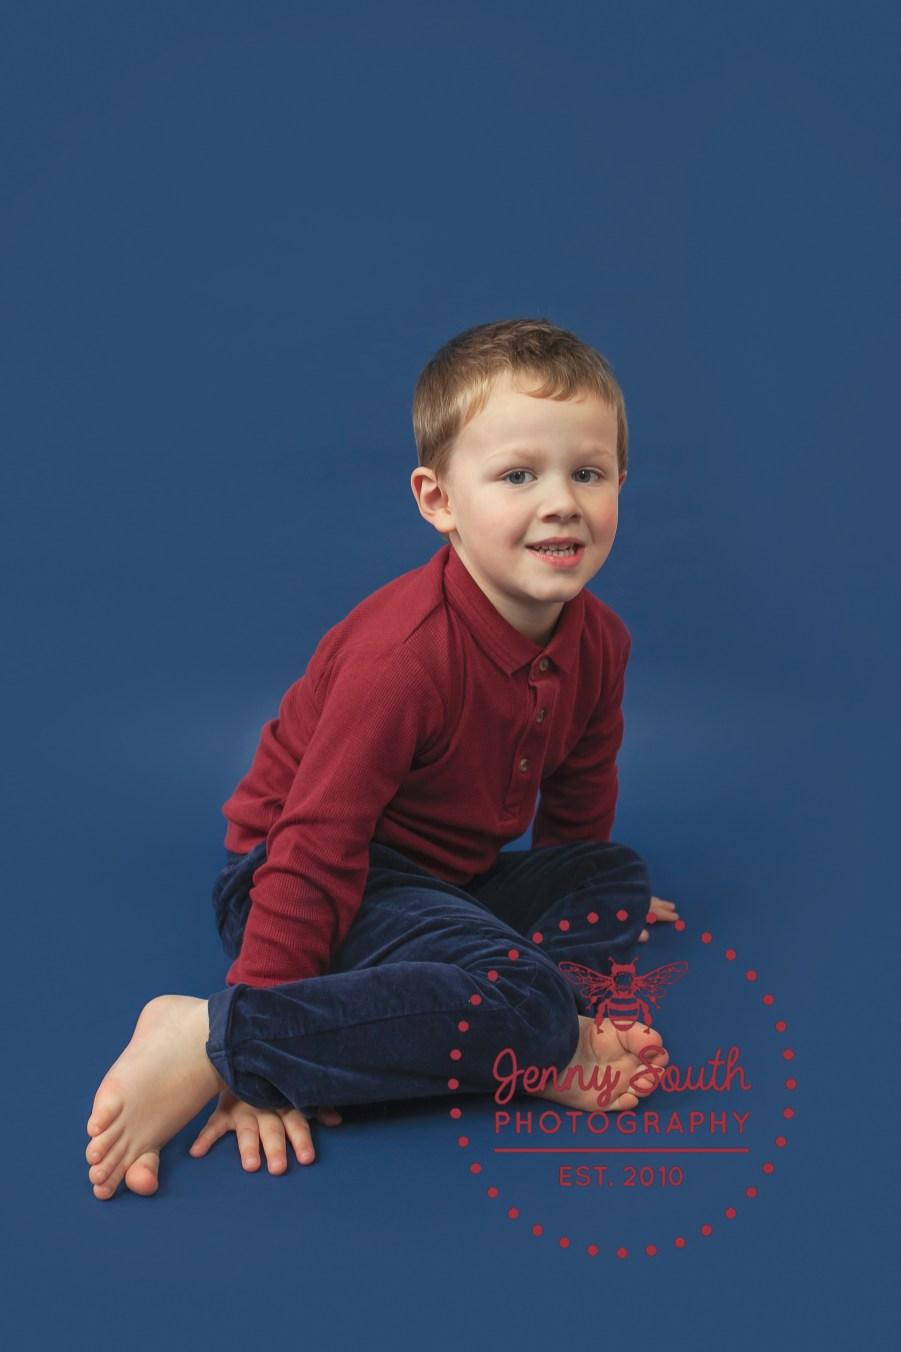 A little boy sits against a navy blue background for a portrait session